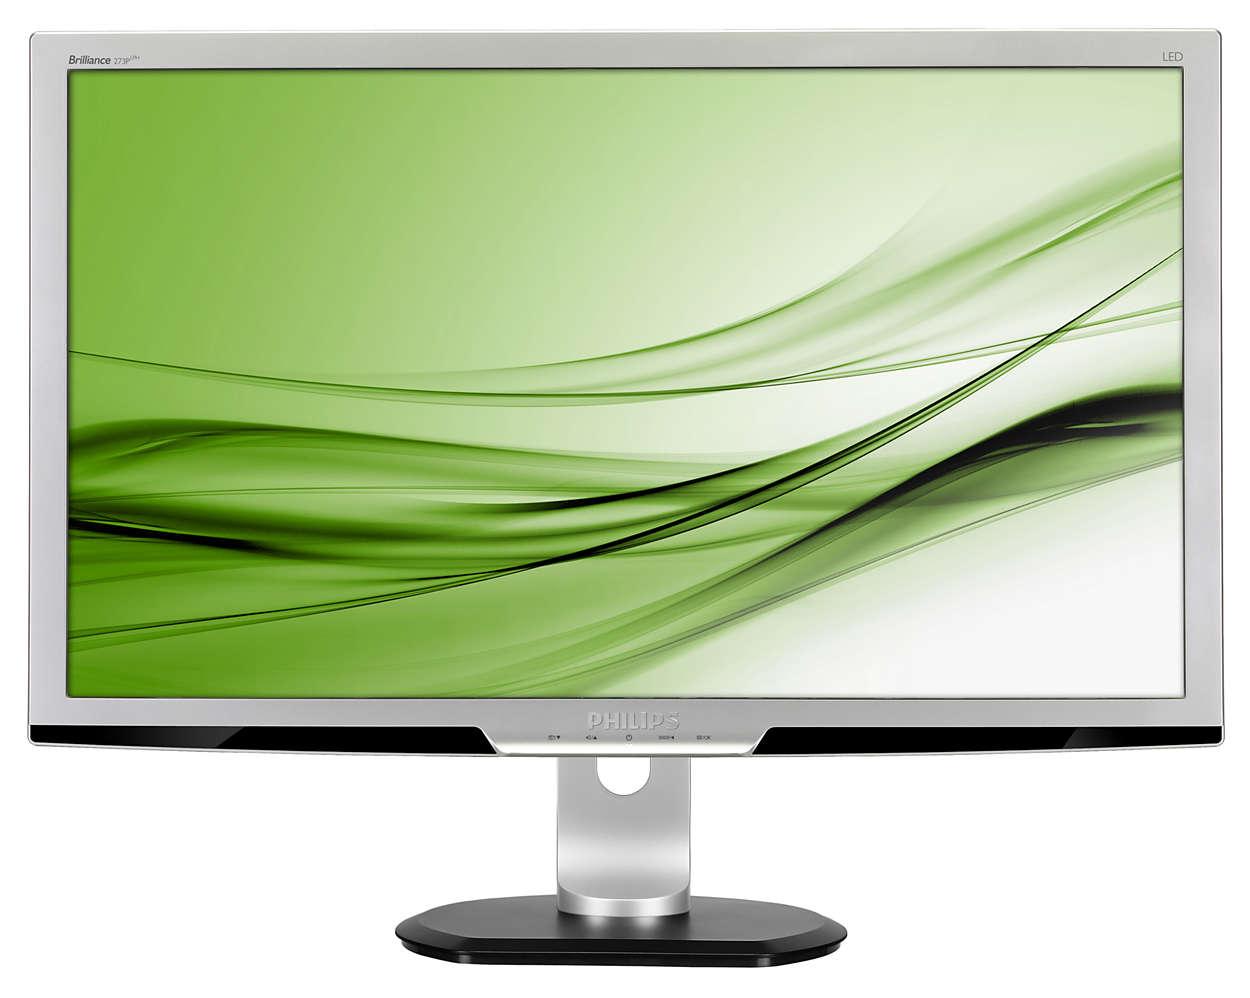 Ecrã PowerSensor inovador economiza energia